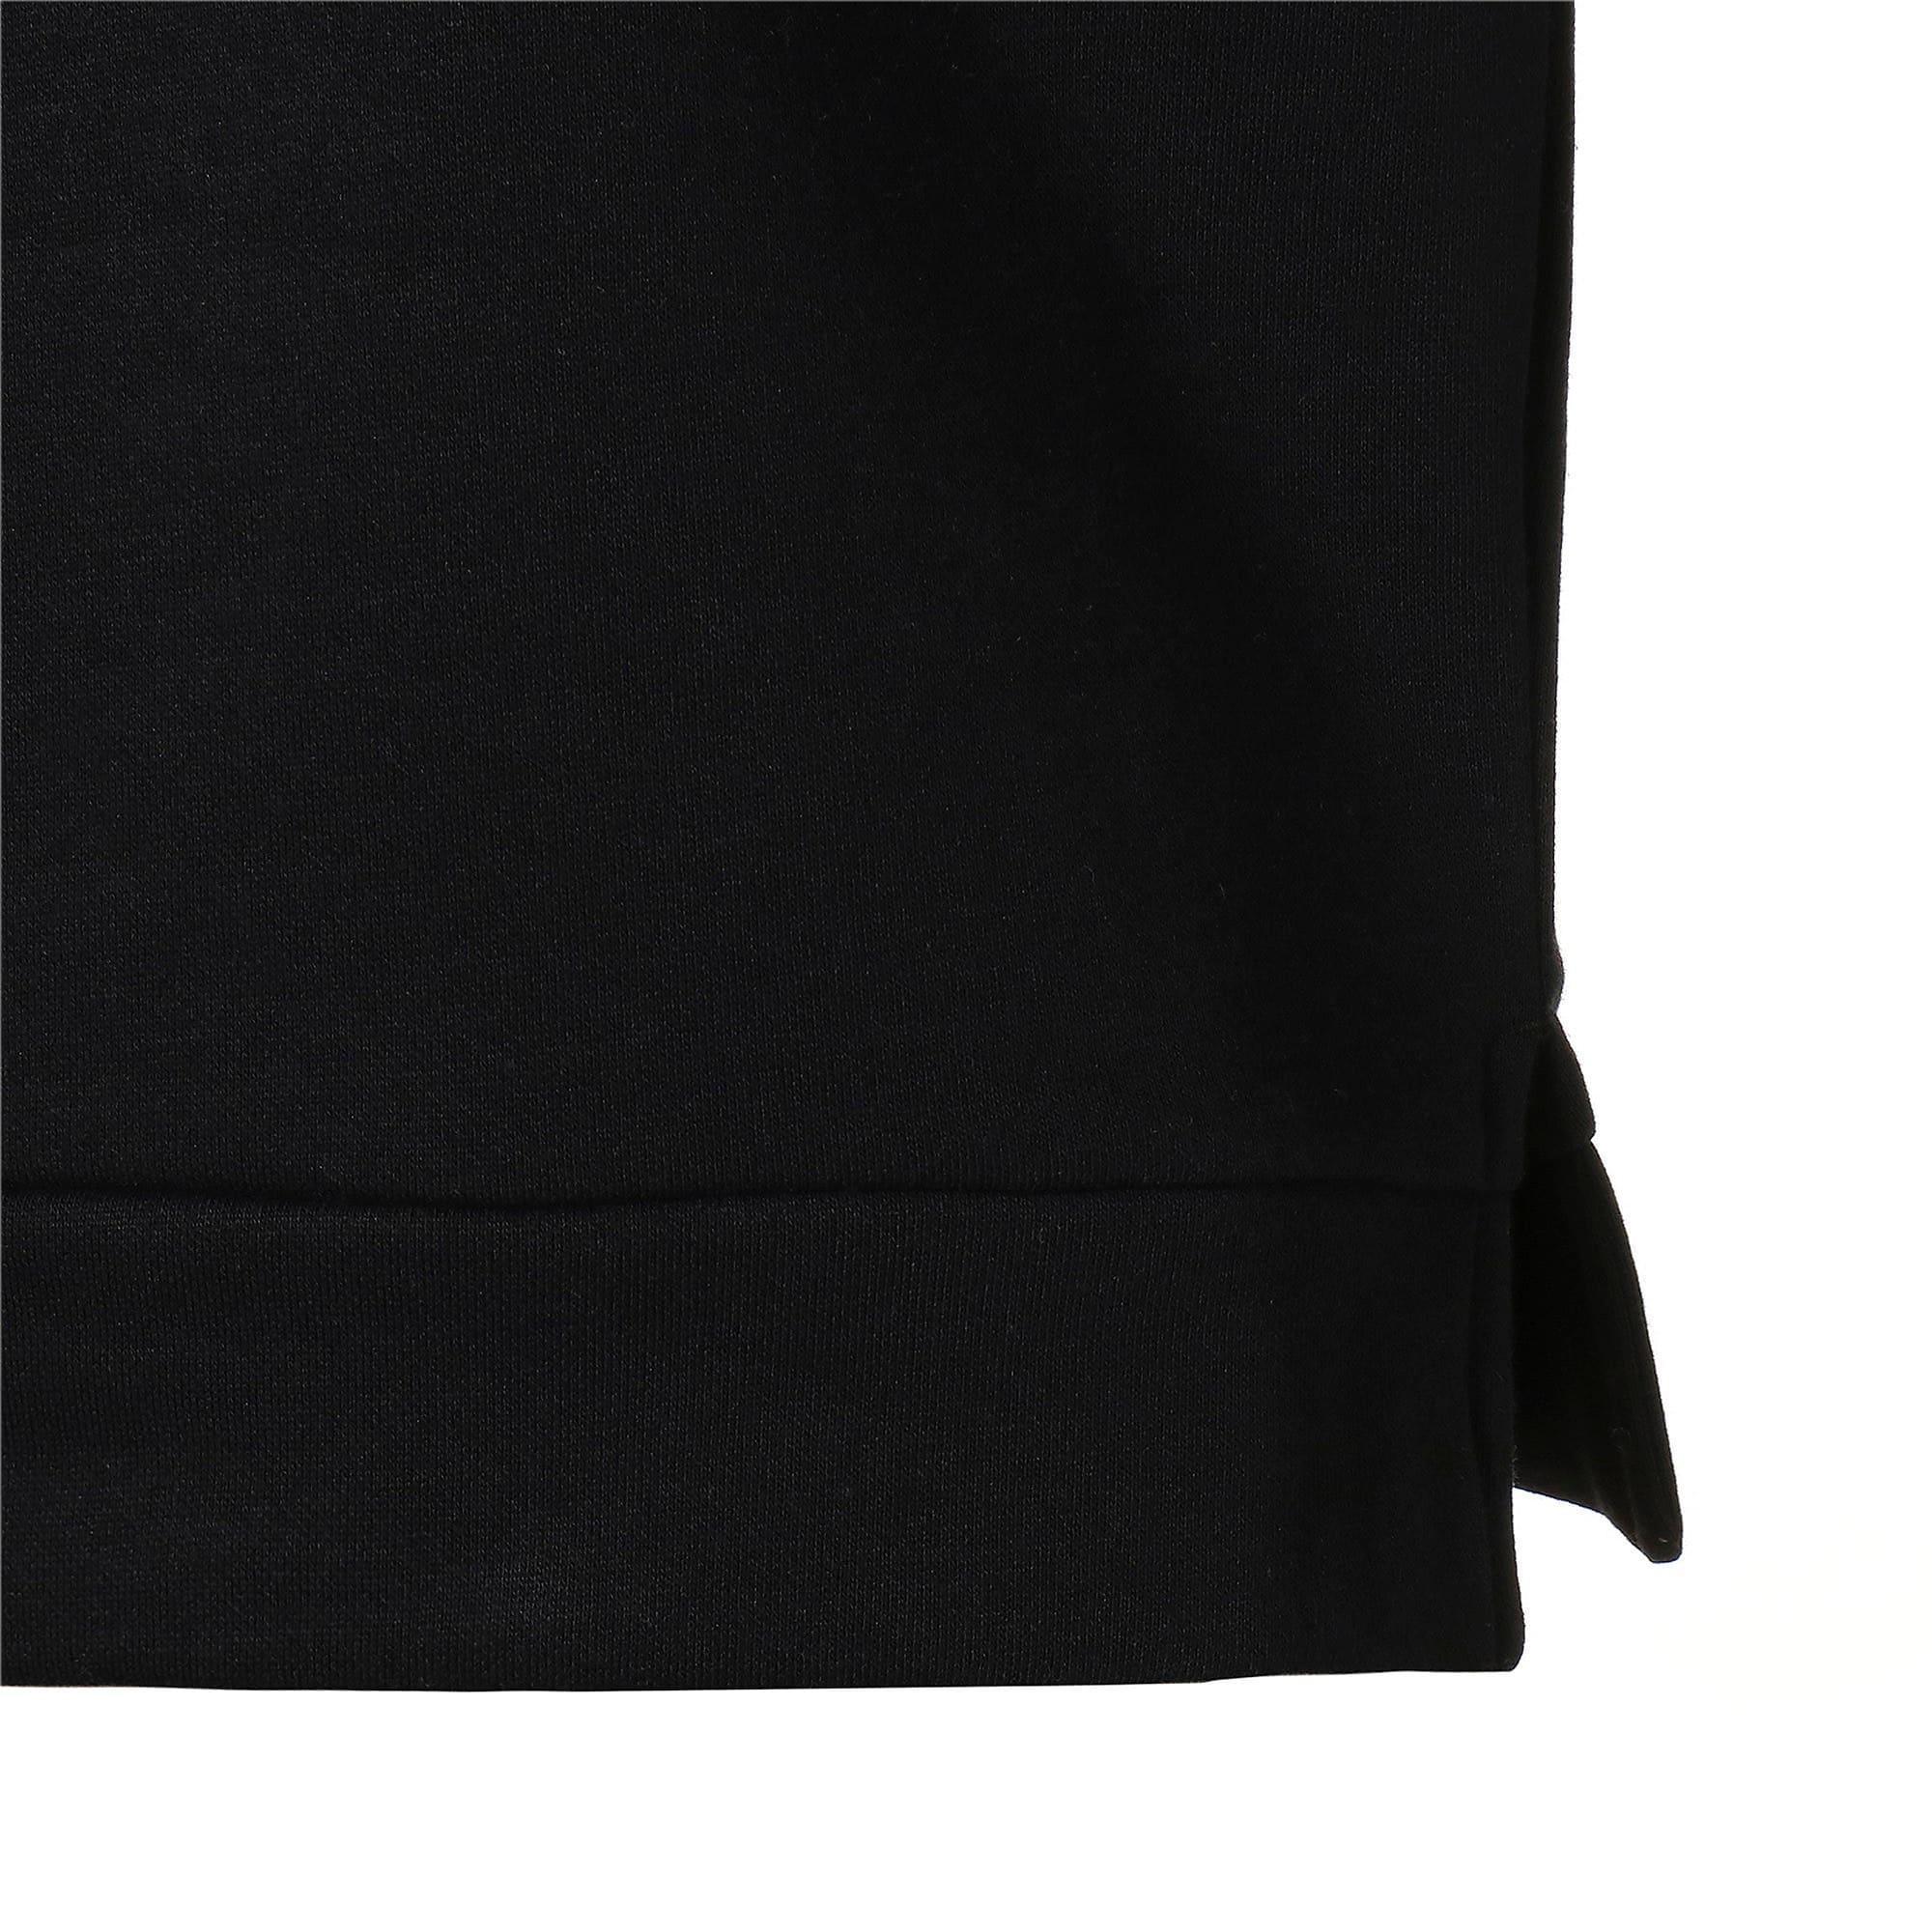 Thumbnail 6 of キッズ アルファ グラフィック クルー スウェット FL, Puma Black, medium-JPN